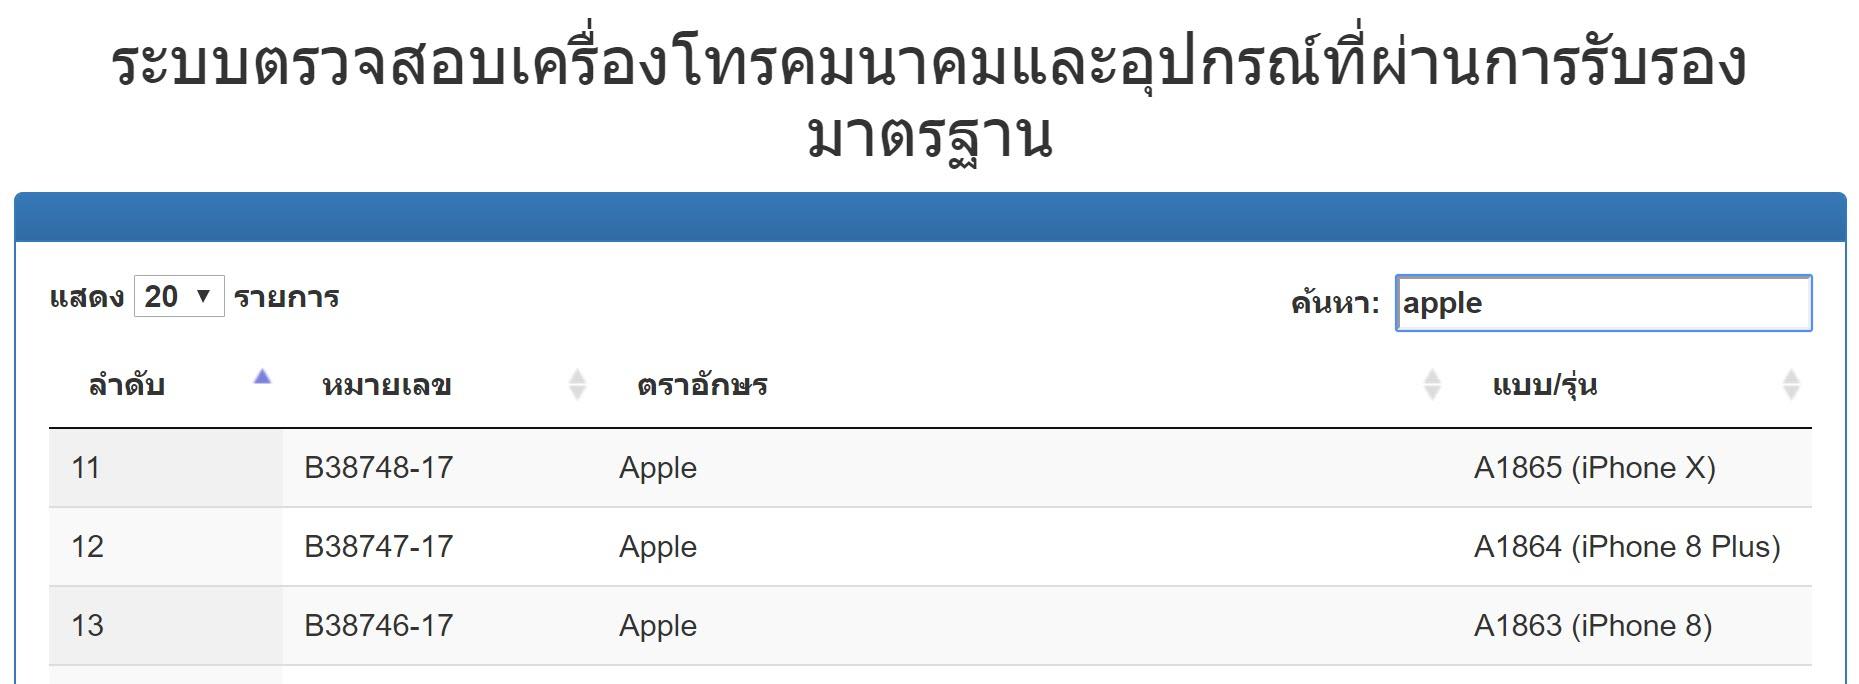 Nbtc Approve Iphone 8 Iphone X Qualcomm Modem Th 1